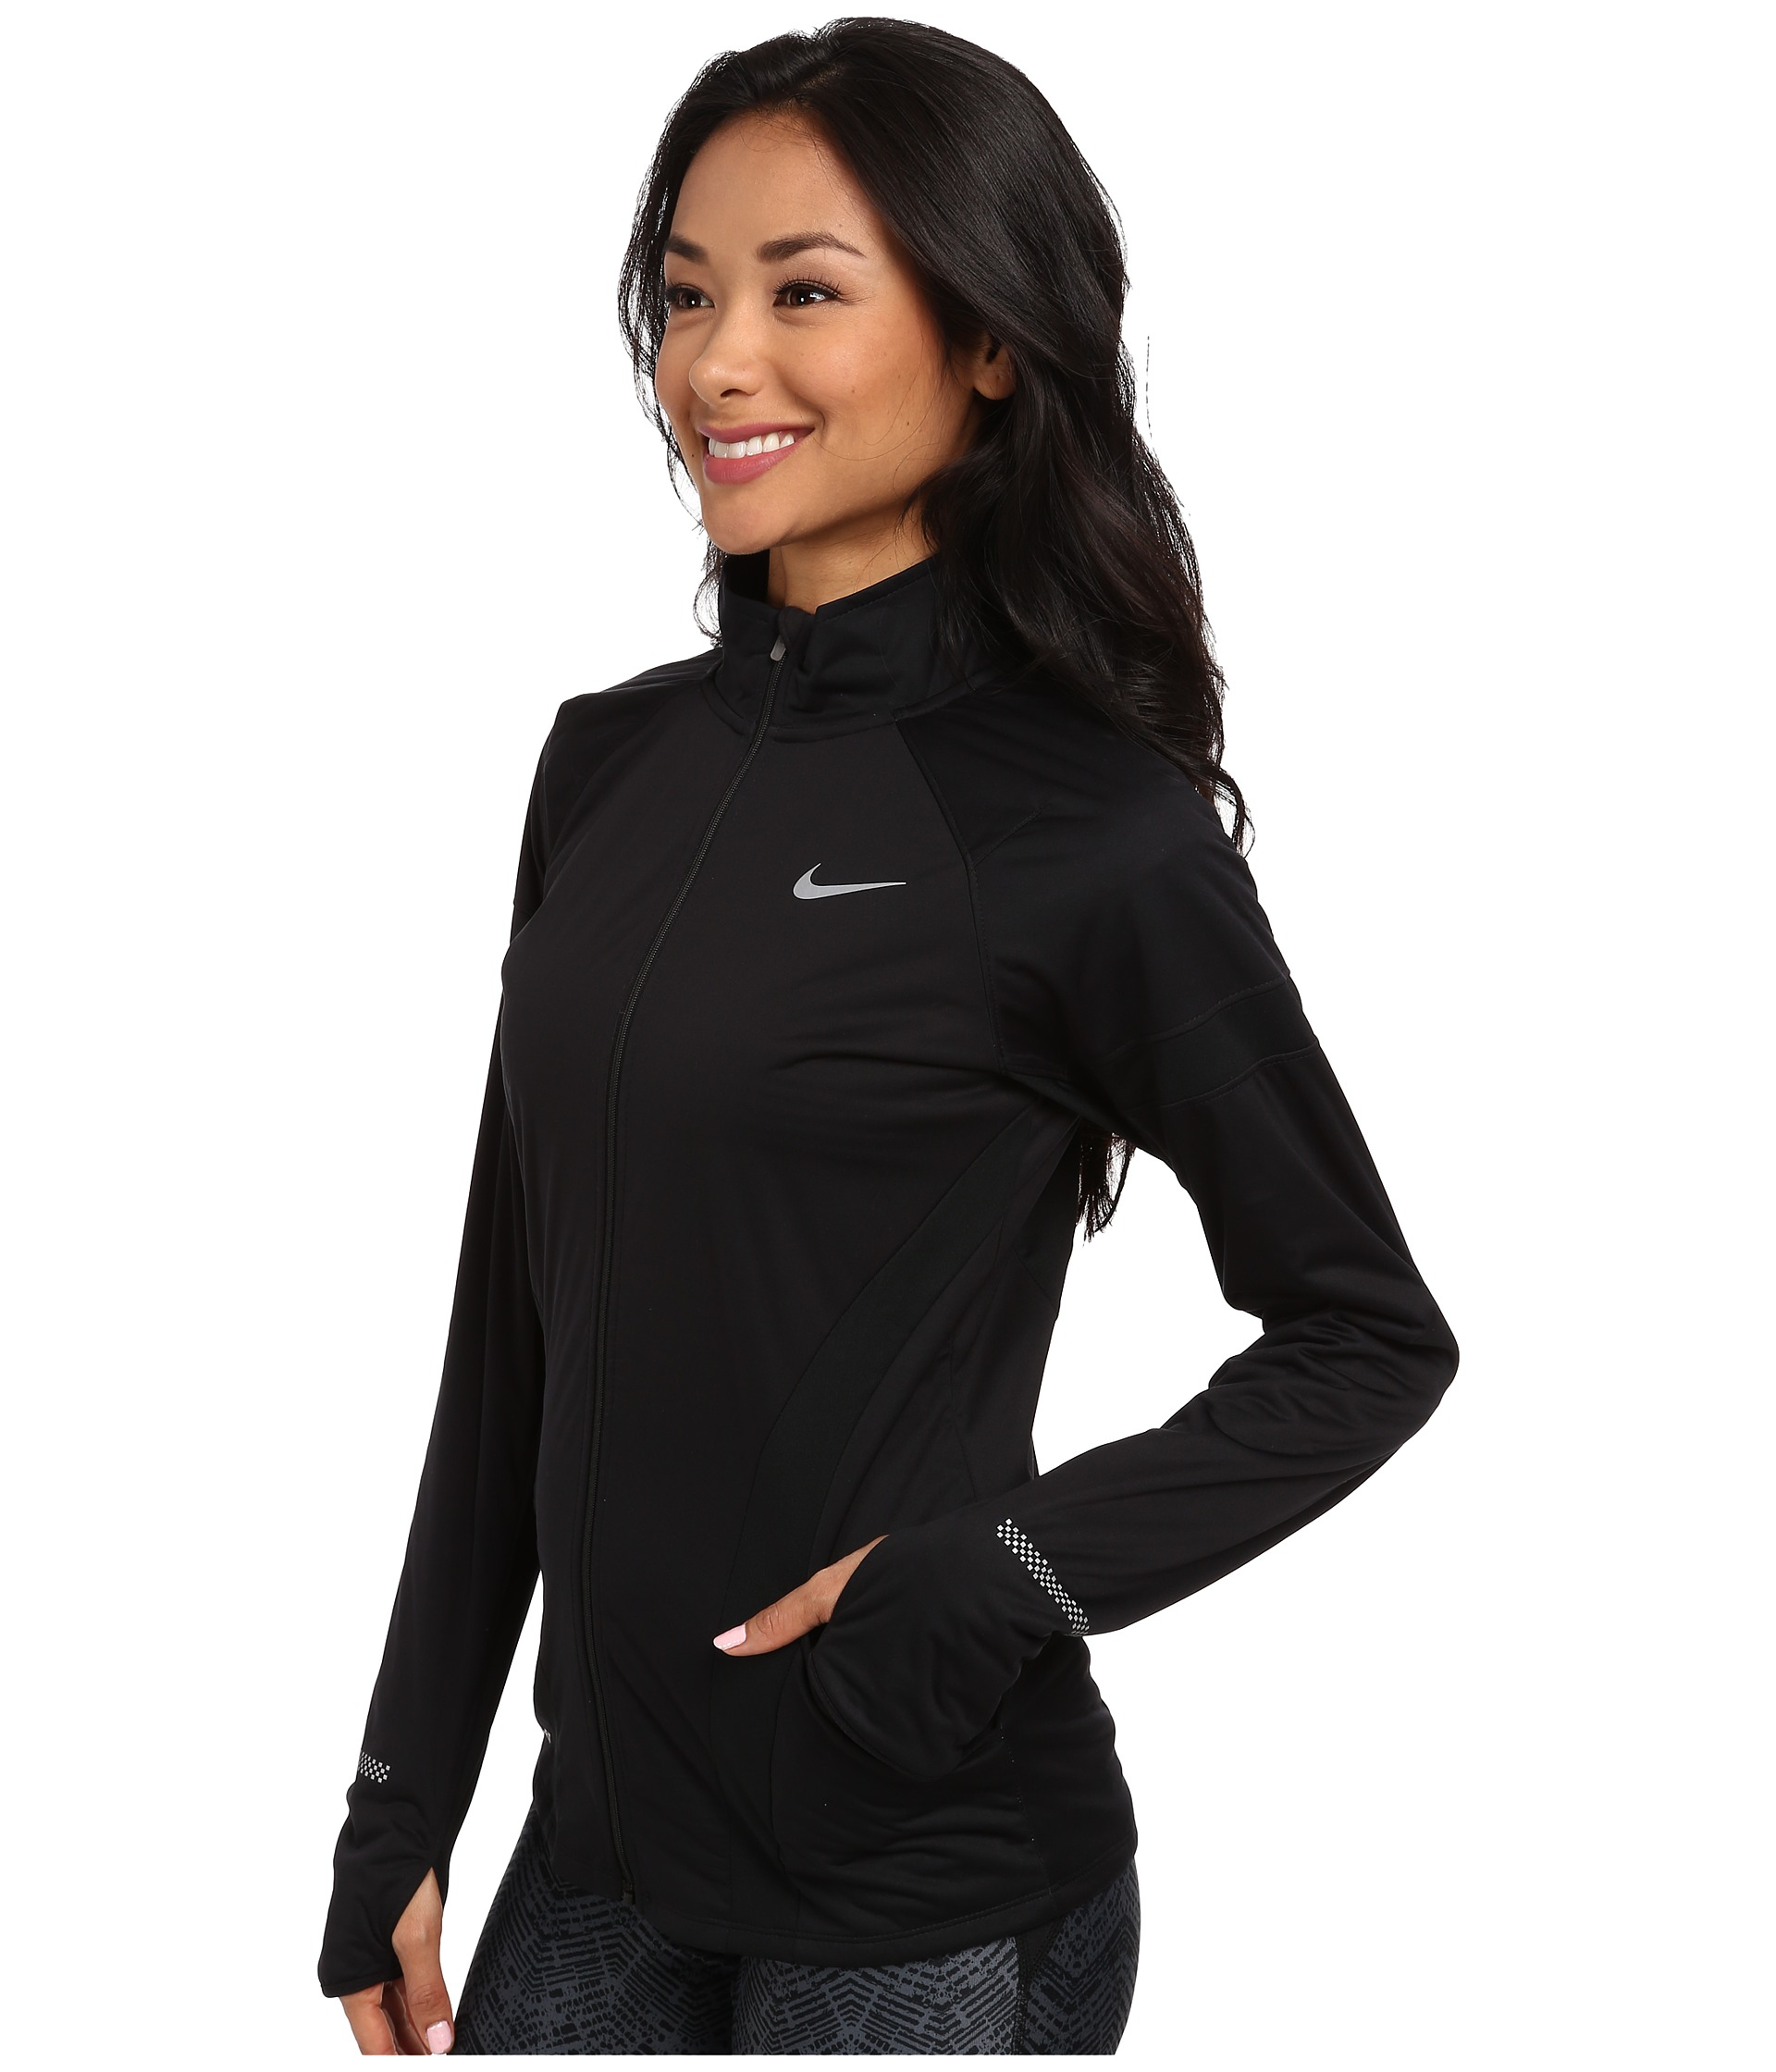 ff1f61d700c5 Lyst - Nike Element Shield Full-Zip Jacket in Black